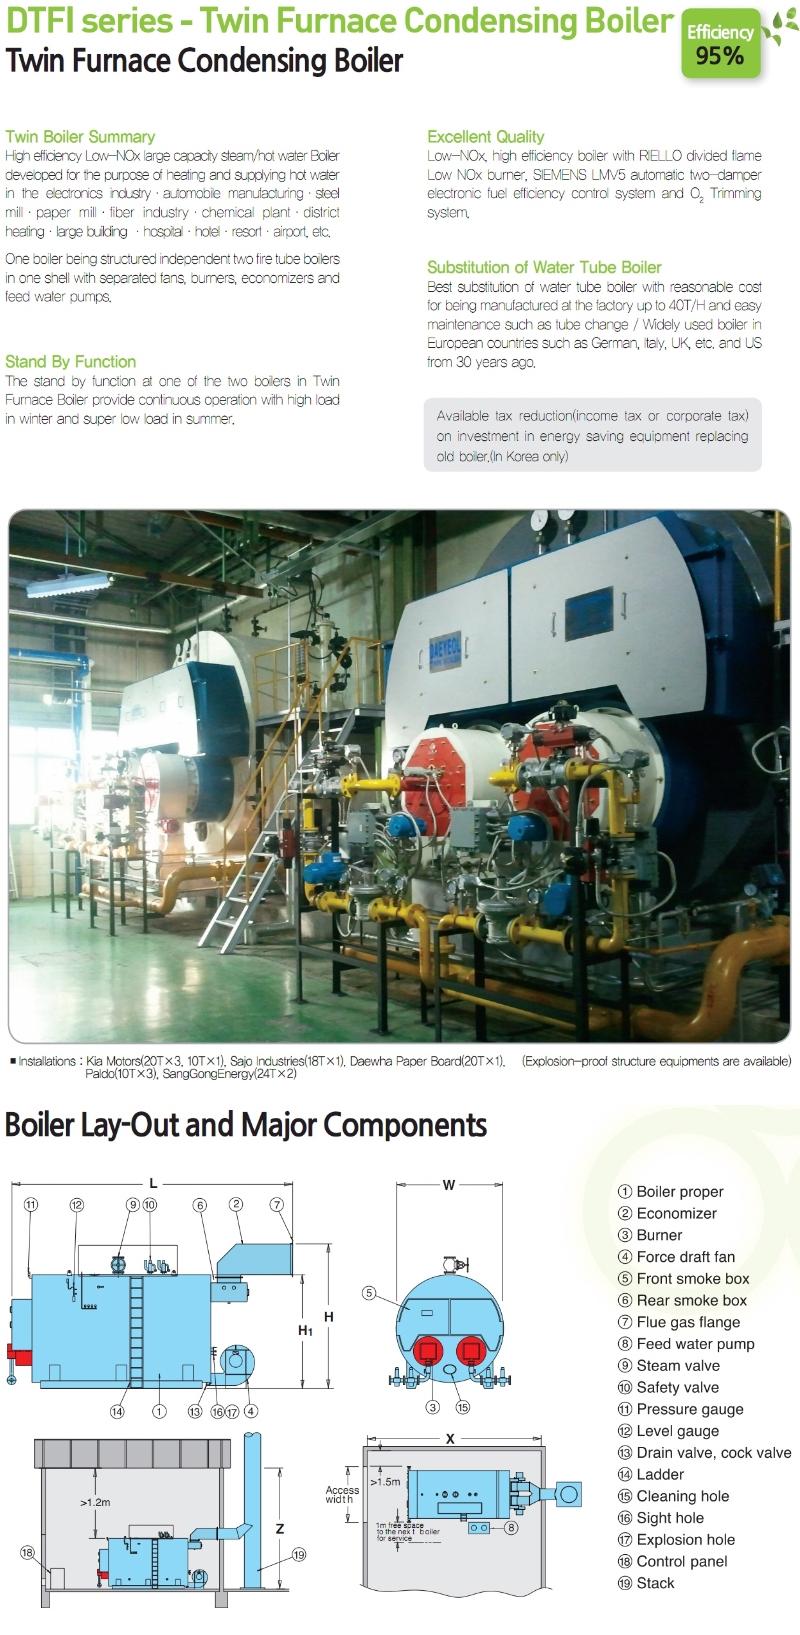 DAEYEOL BOILER - Twin Furnace Condensing Boiler - DTFI-Series - Products